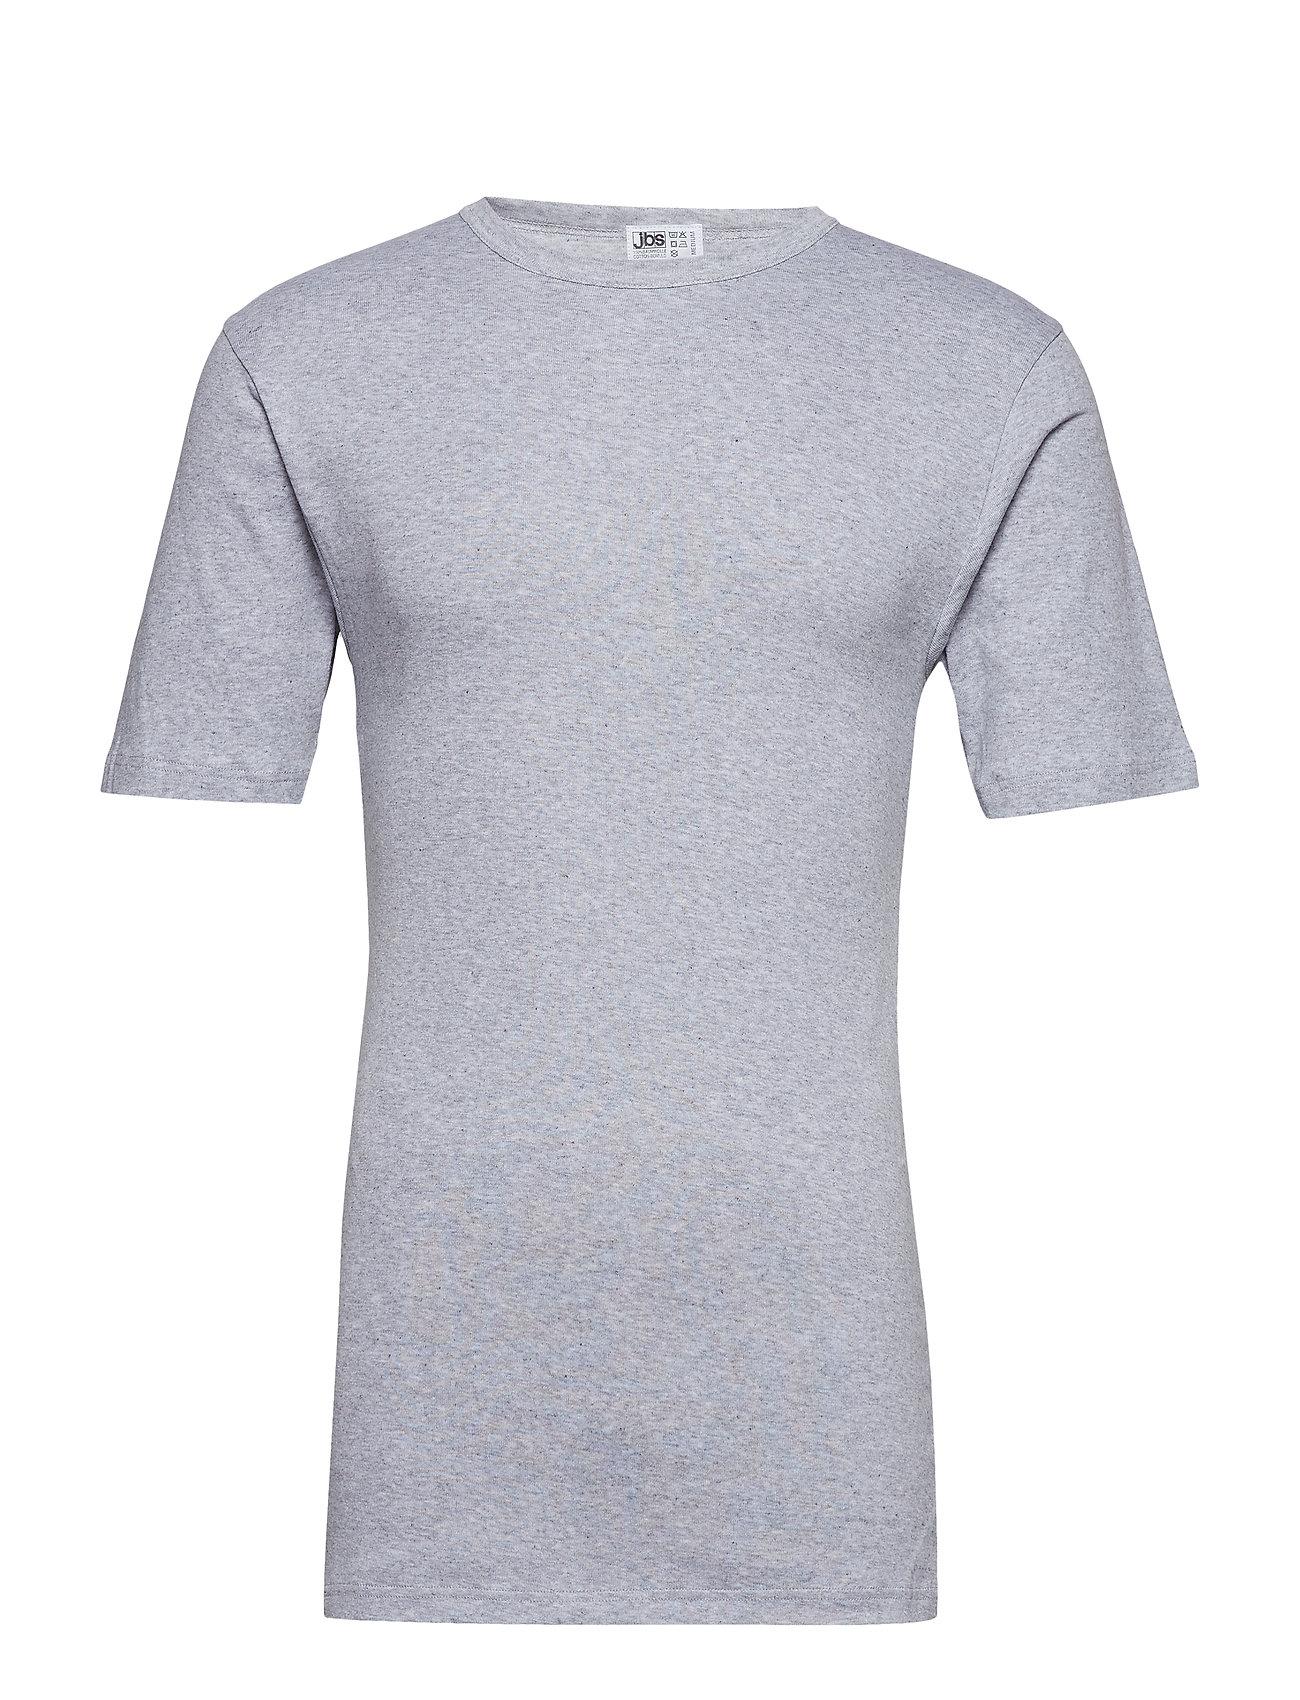 JBS JBS t-shirt original - GREY MEL